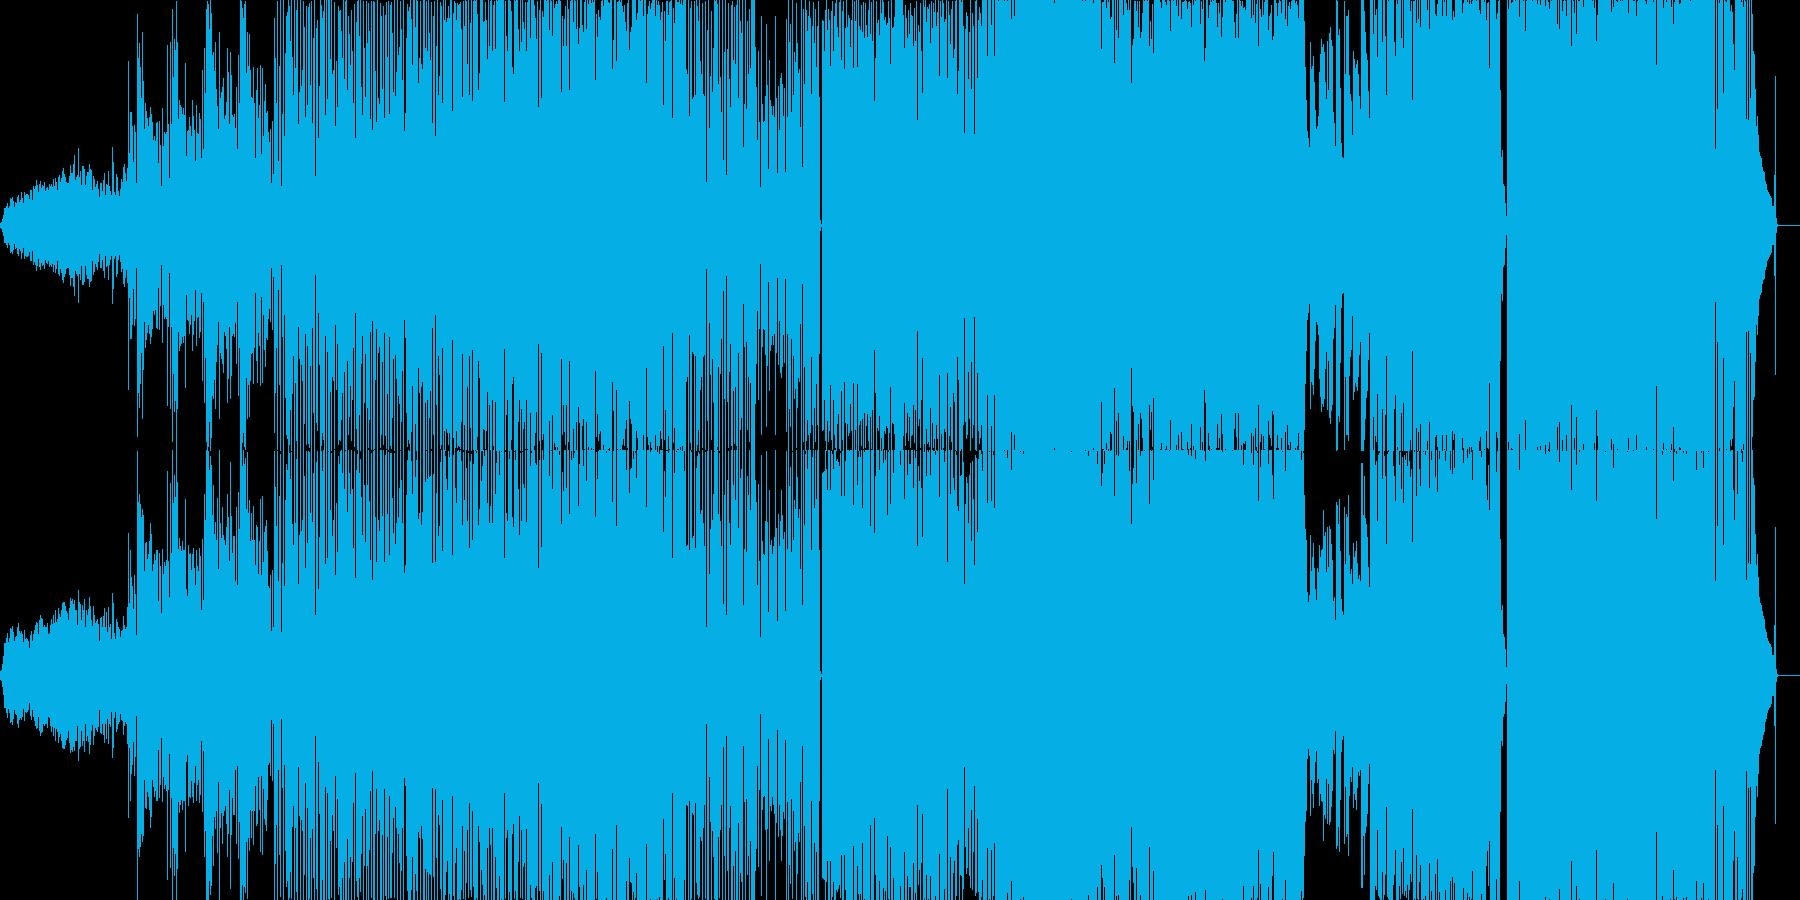 sunpekoの再生済みの波形